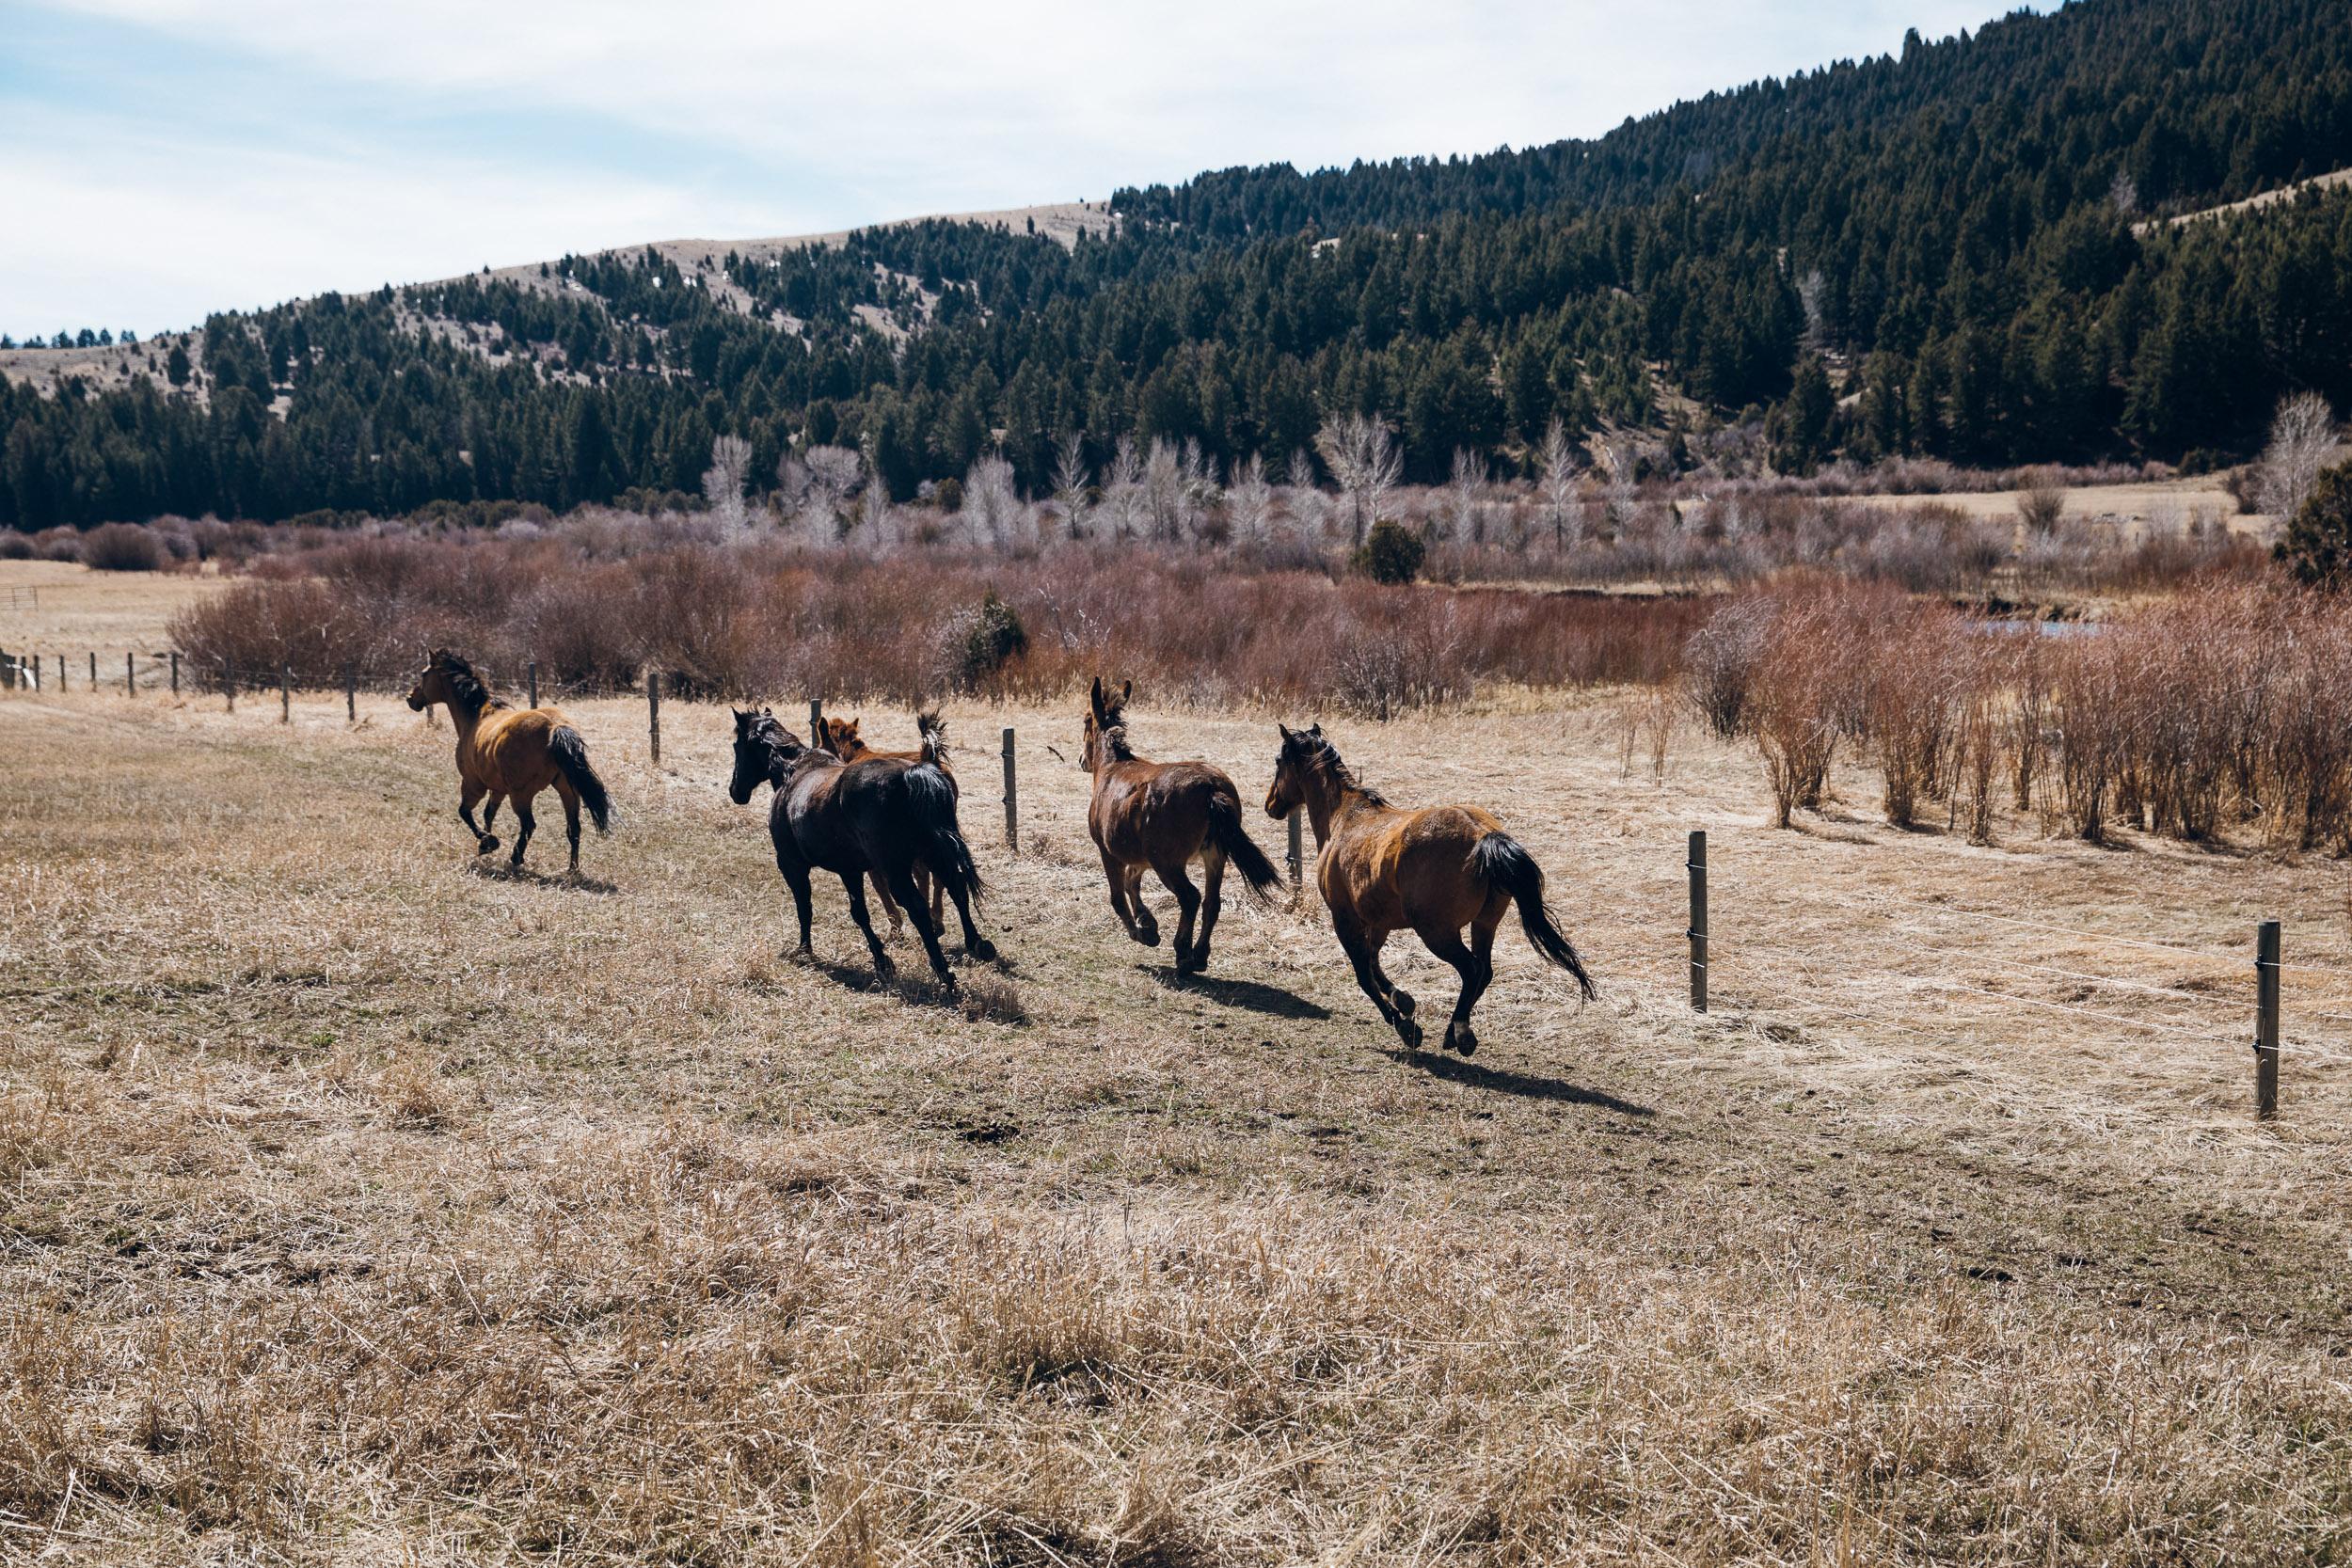 Horses running in a field in Winter in Montana